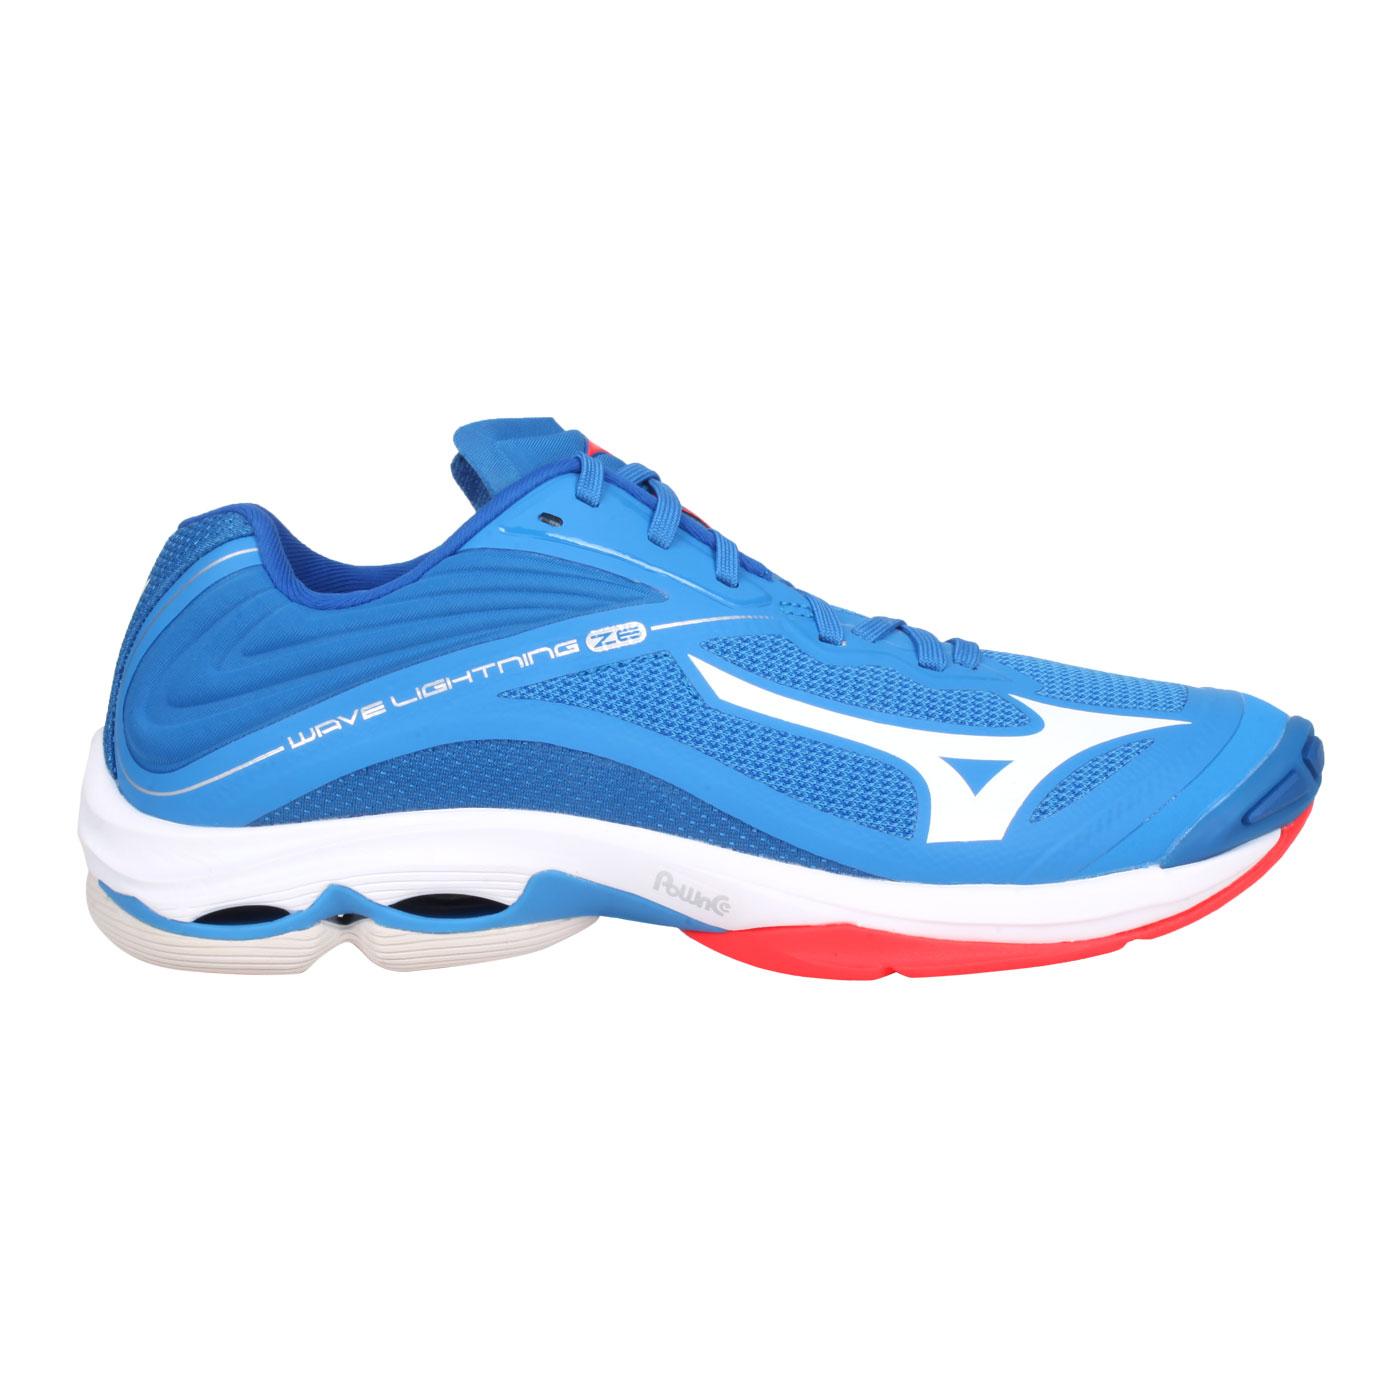 MIZUNO 排球鞋  @WAVE LIGHTNING Z6@V1GA200024